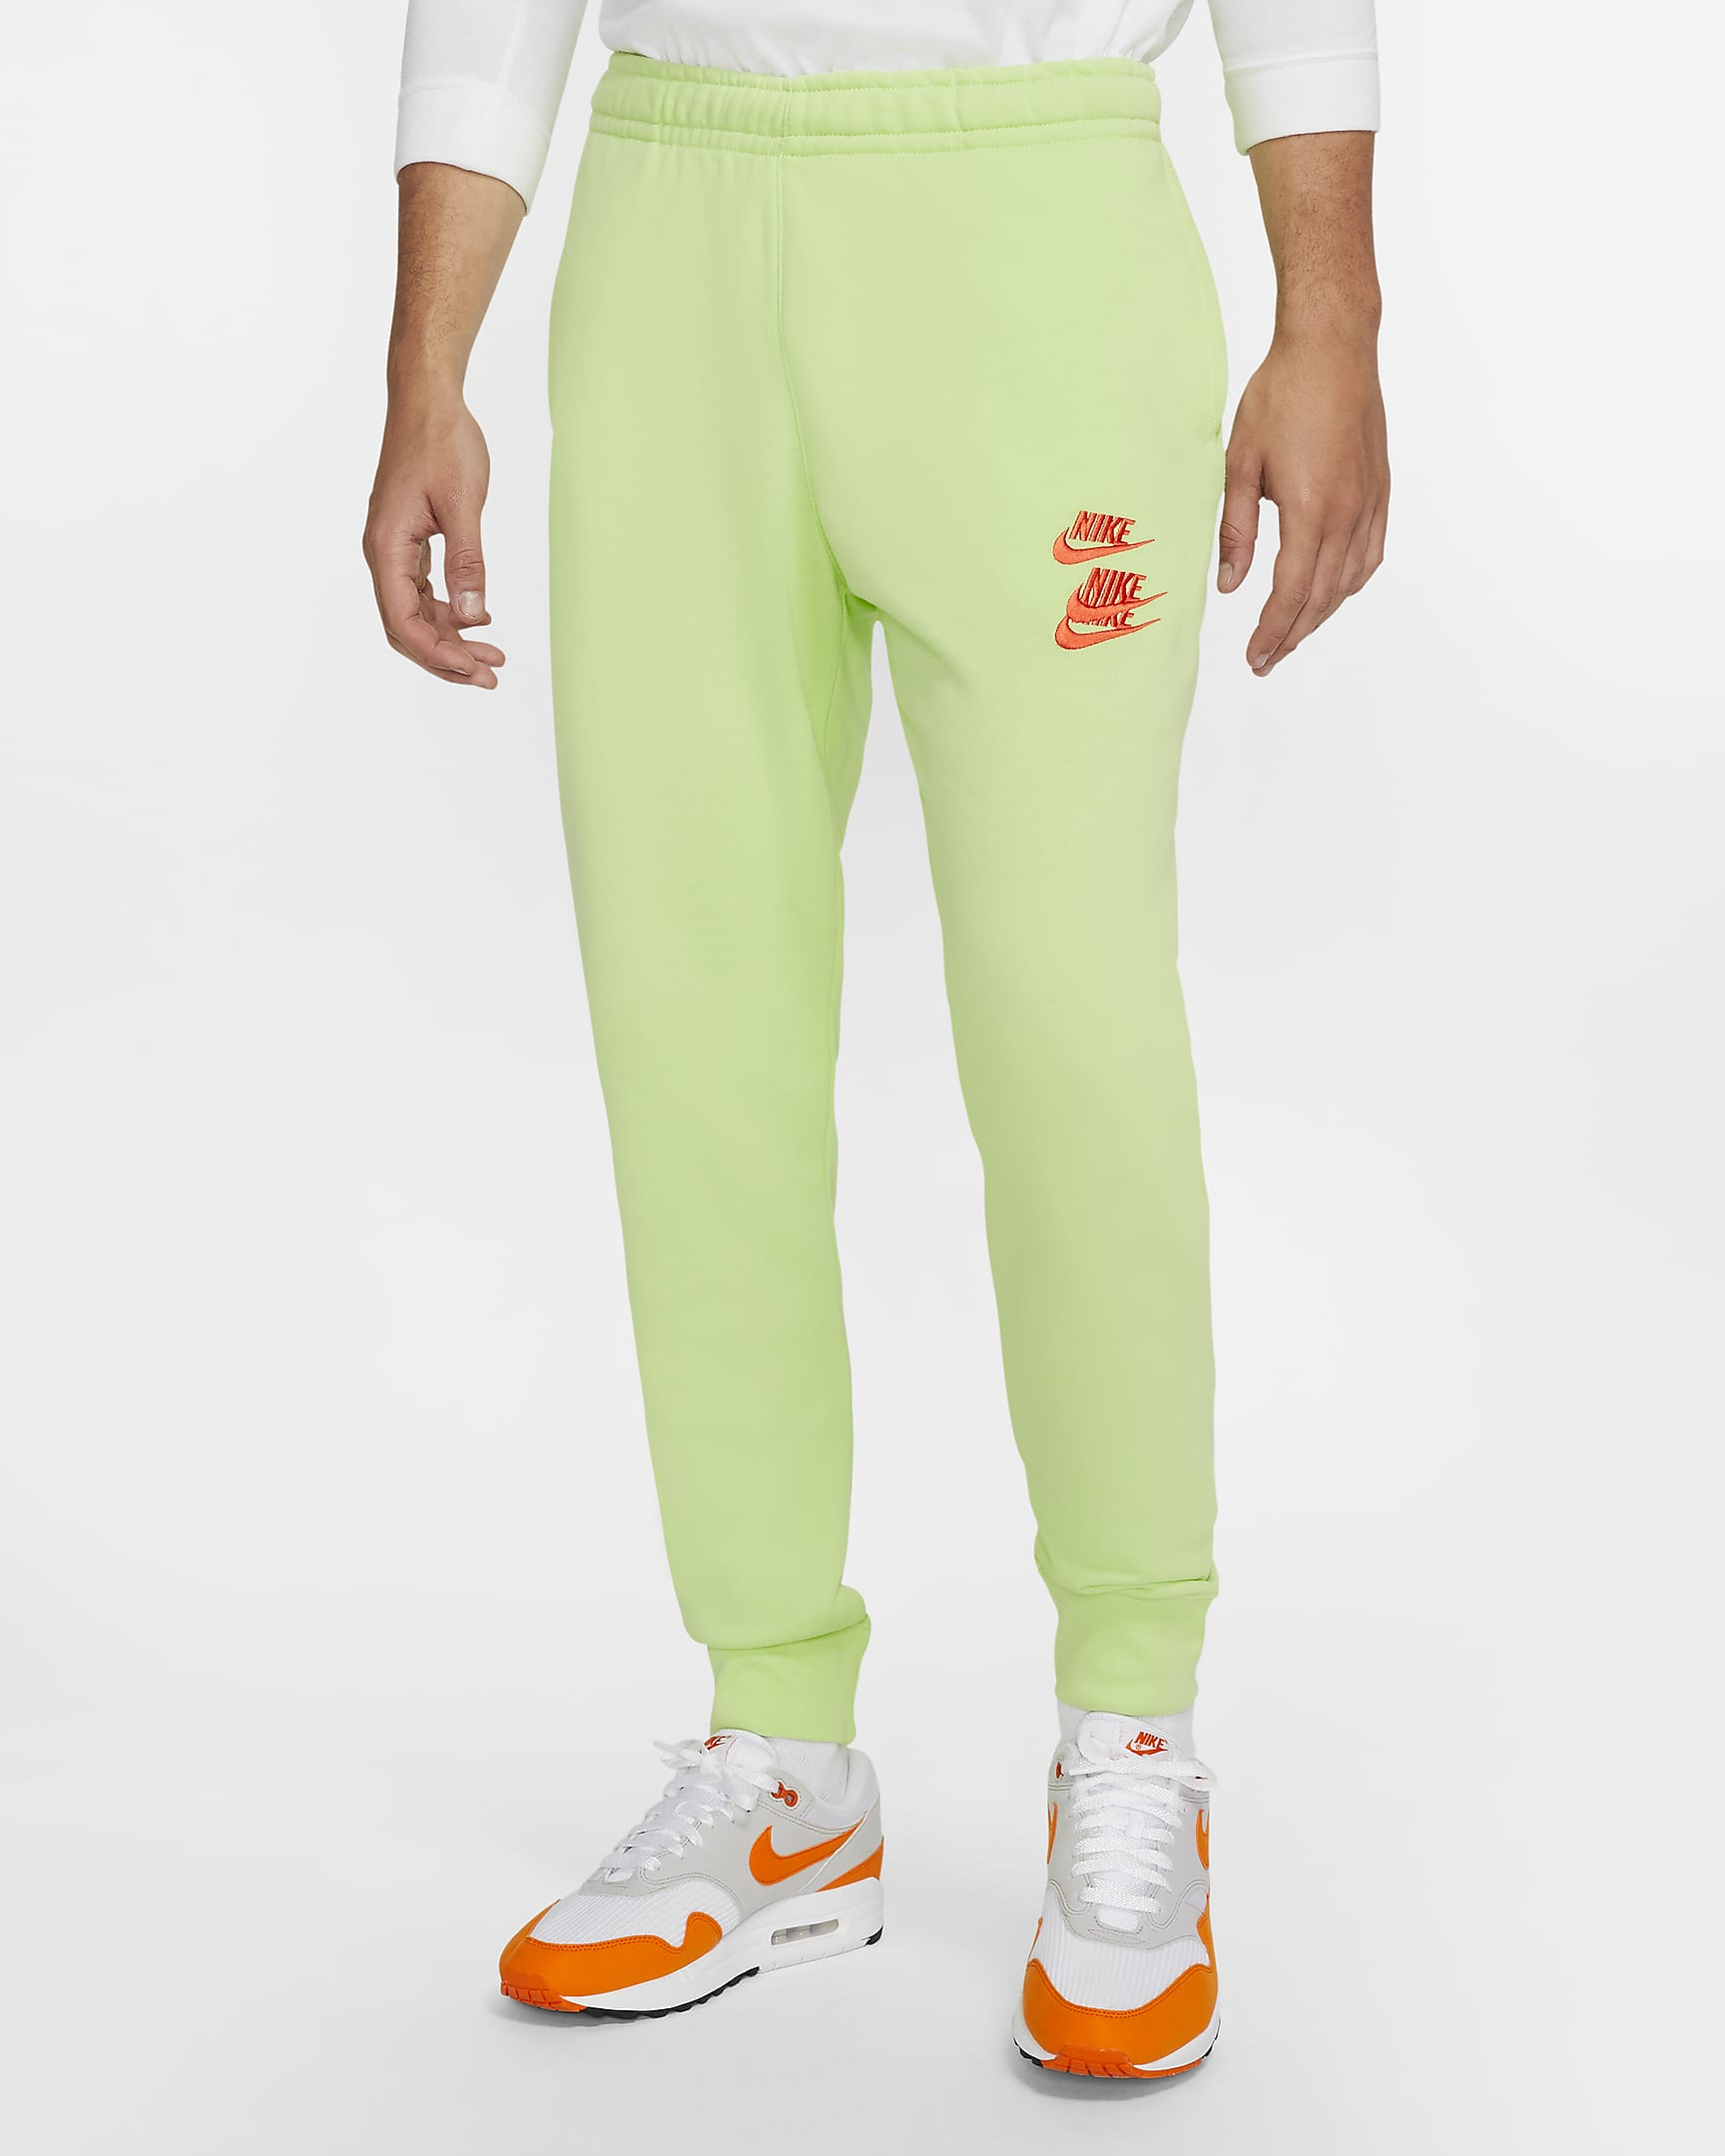 sportswear-mens-pants-XHBl02-4